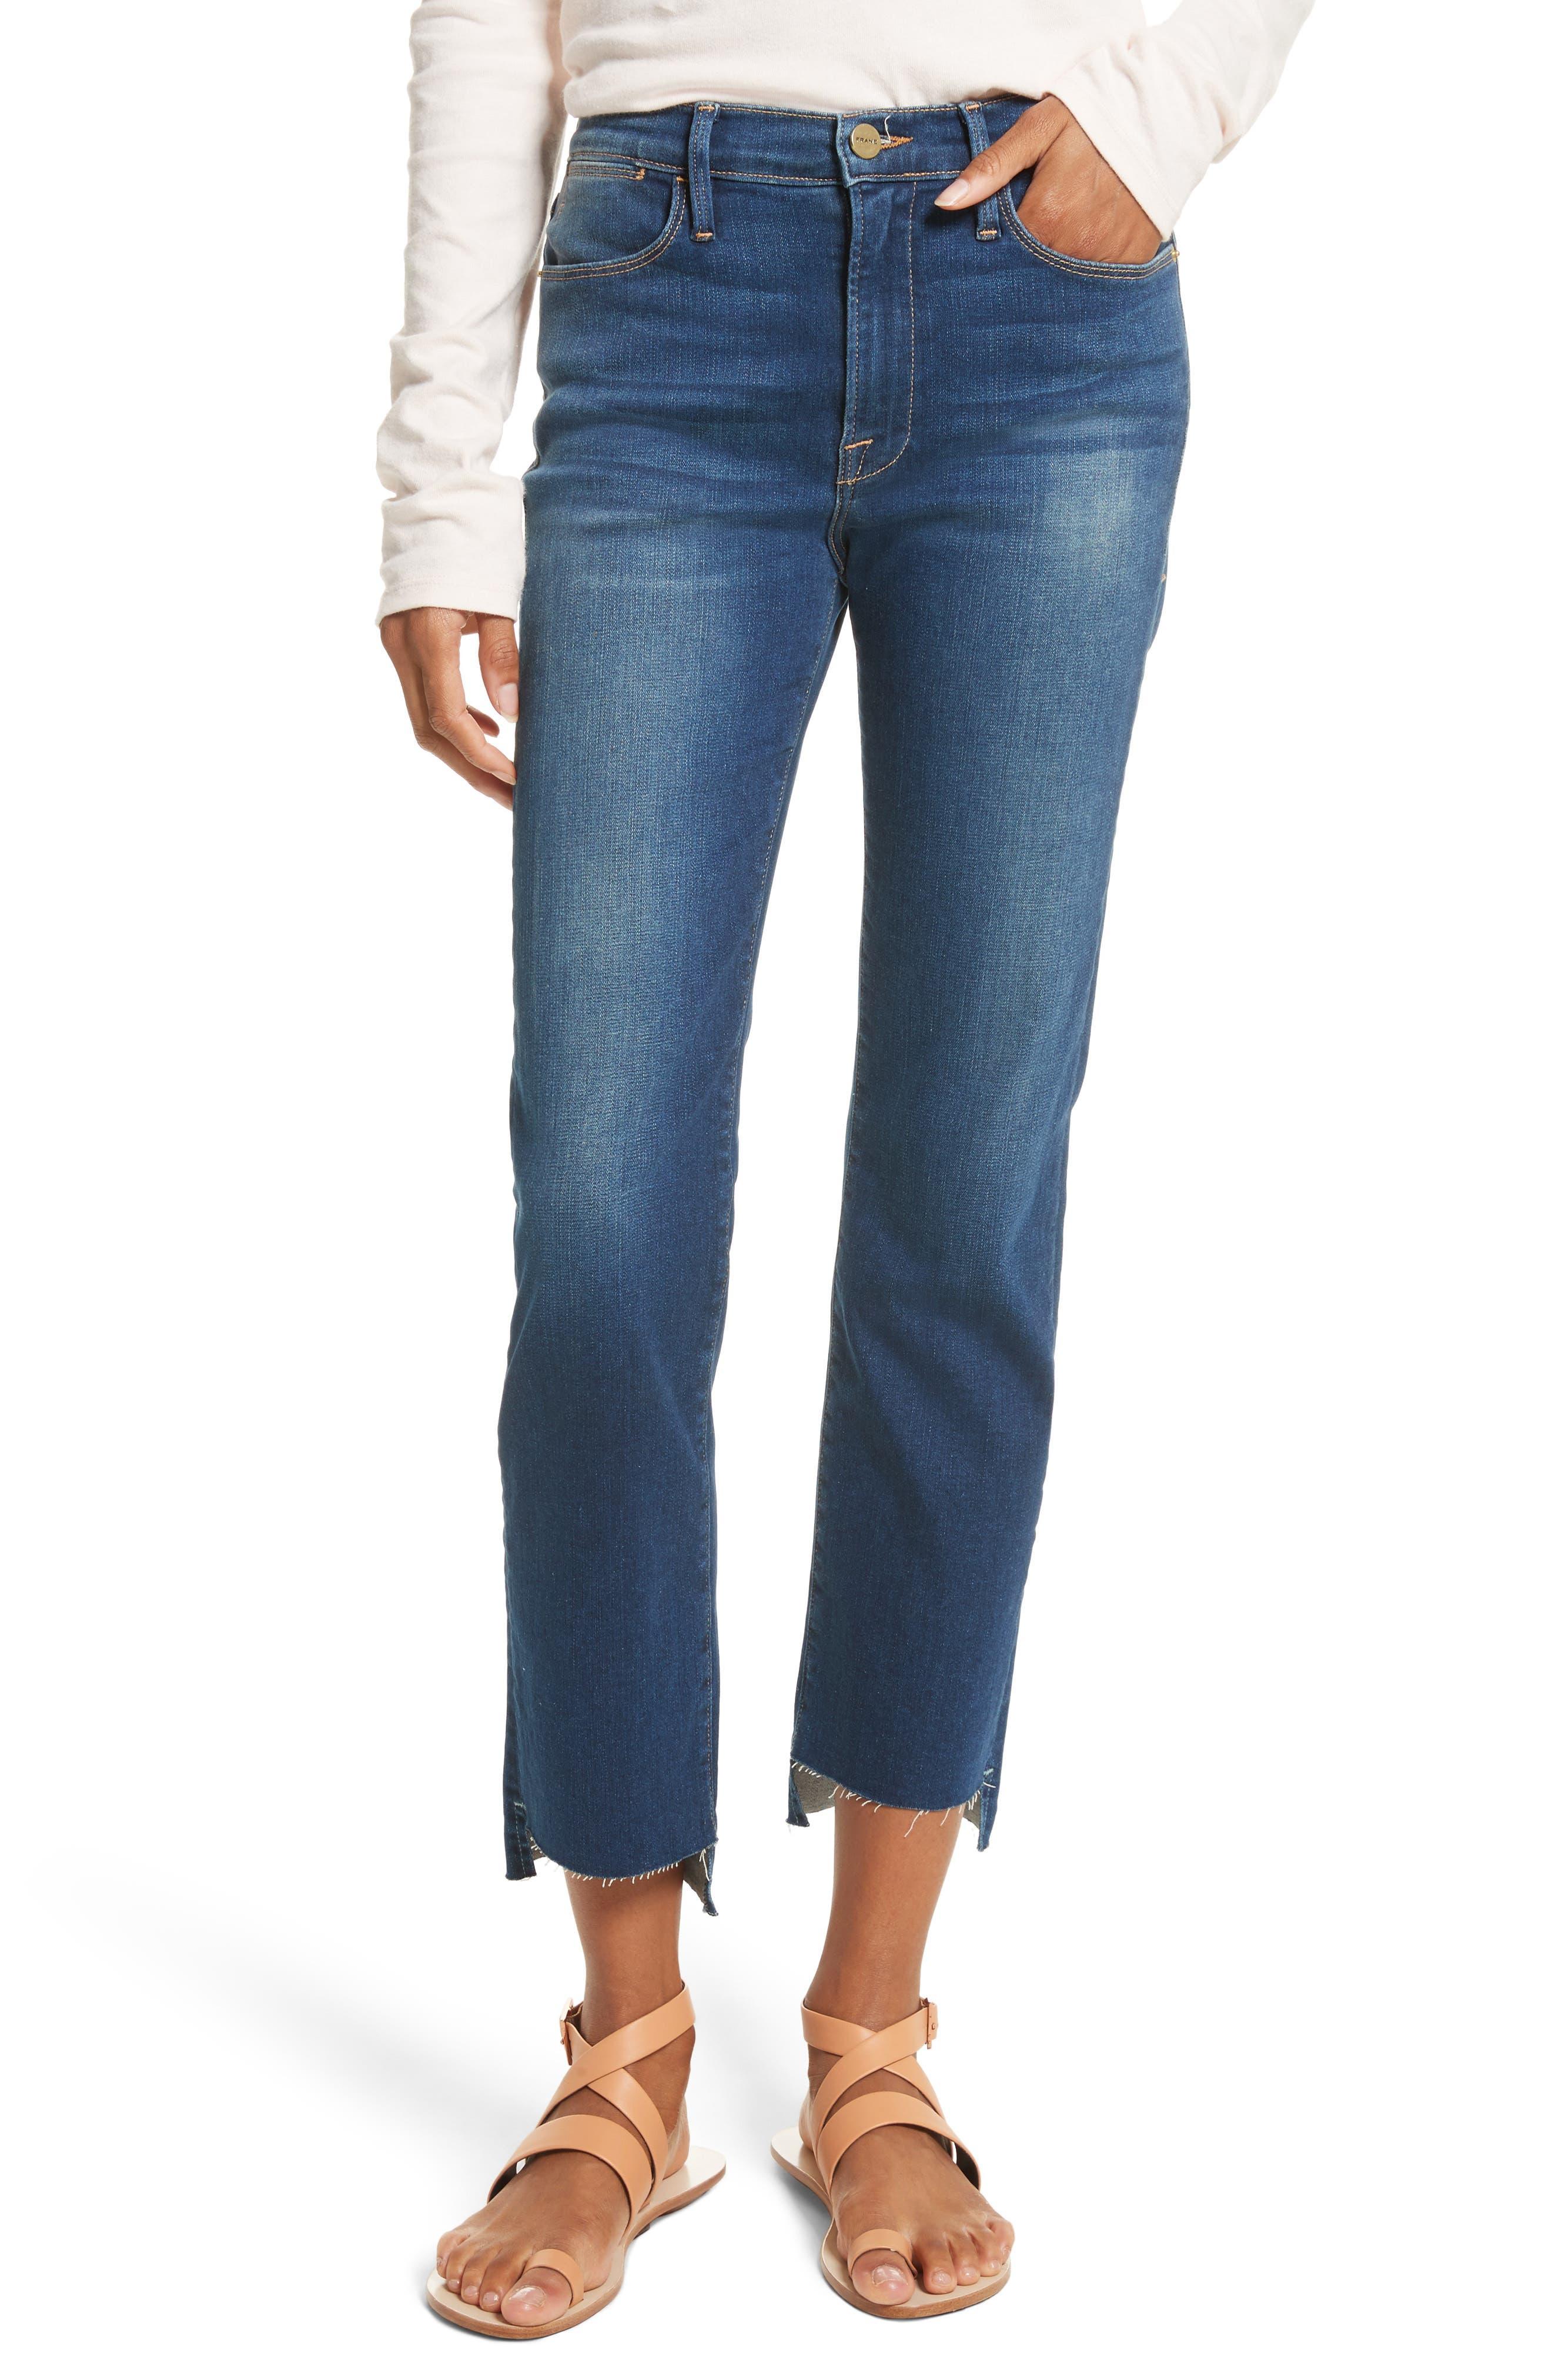 Le High Straight High Waist Raw Stagger Jeans,                             Main thumbnail 1, color,                             Murrayfield